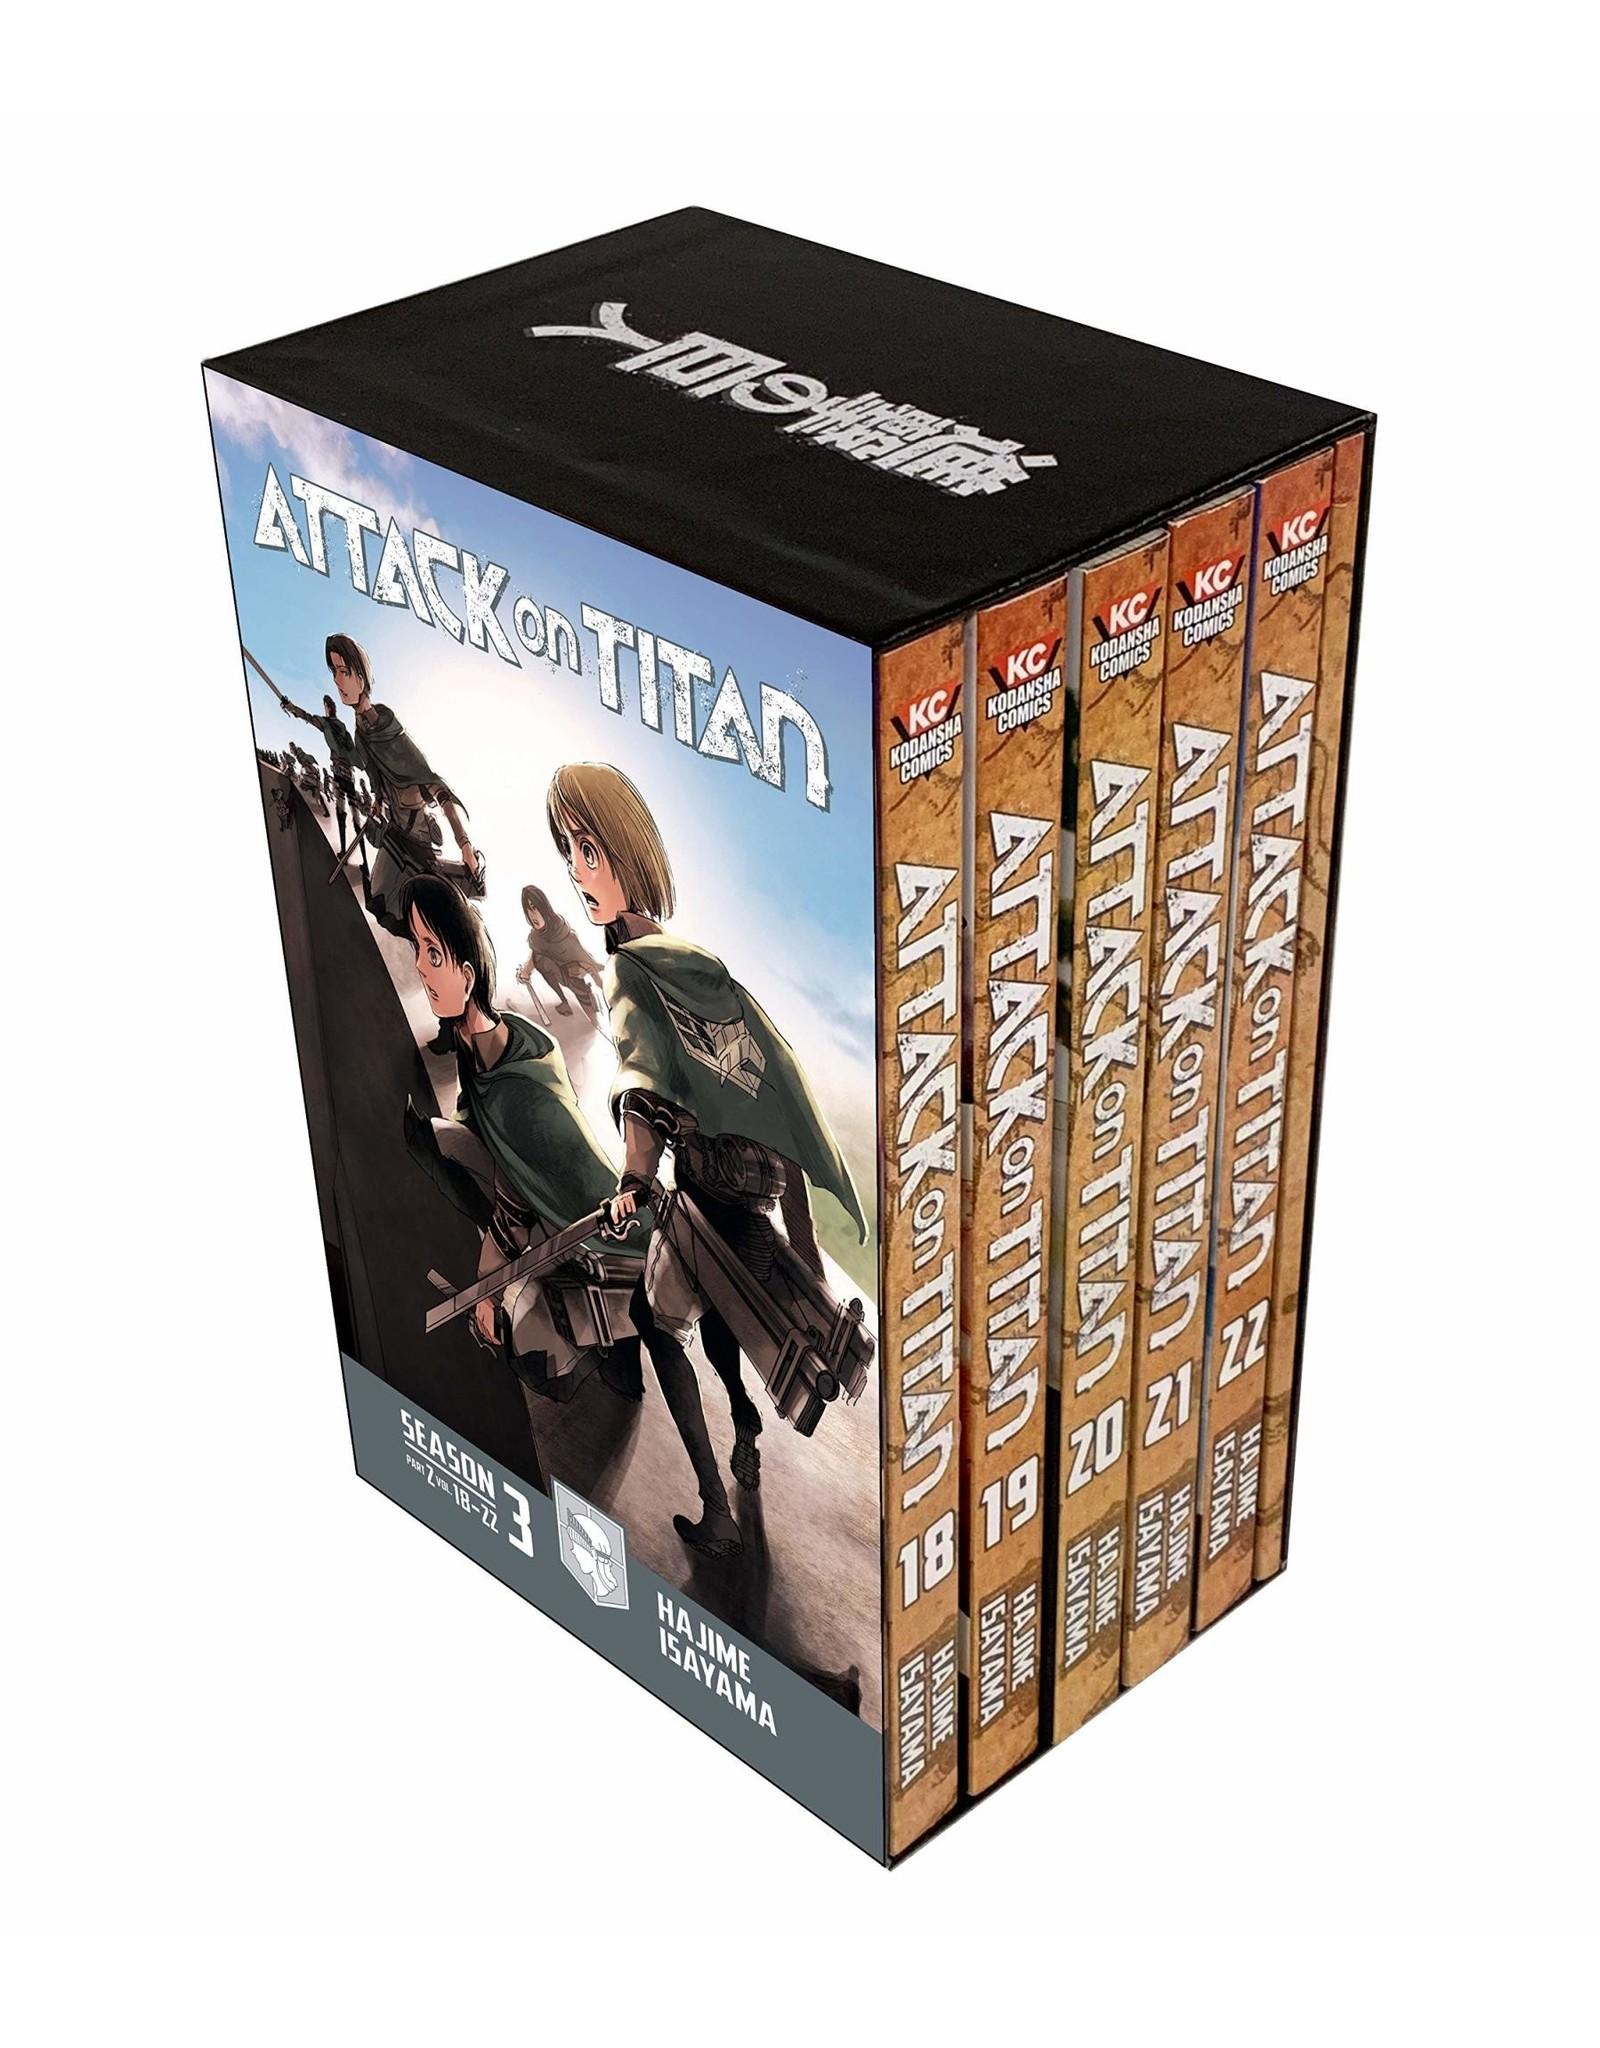 Attack on Titan - Season 3 Part 2 - Volumes 18 - 22 - Manga Box Set (Engelstalig)